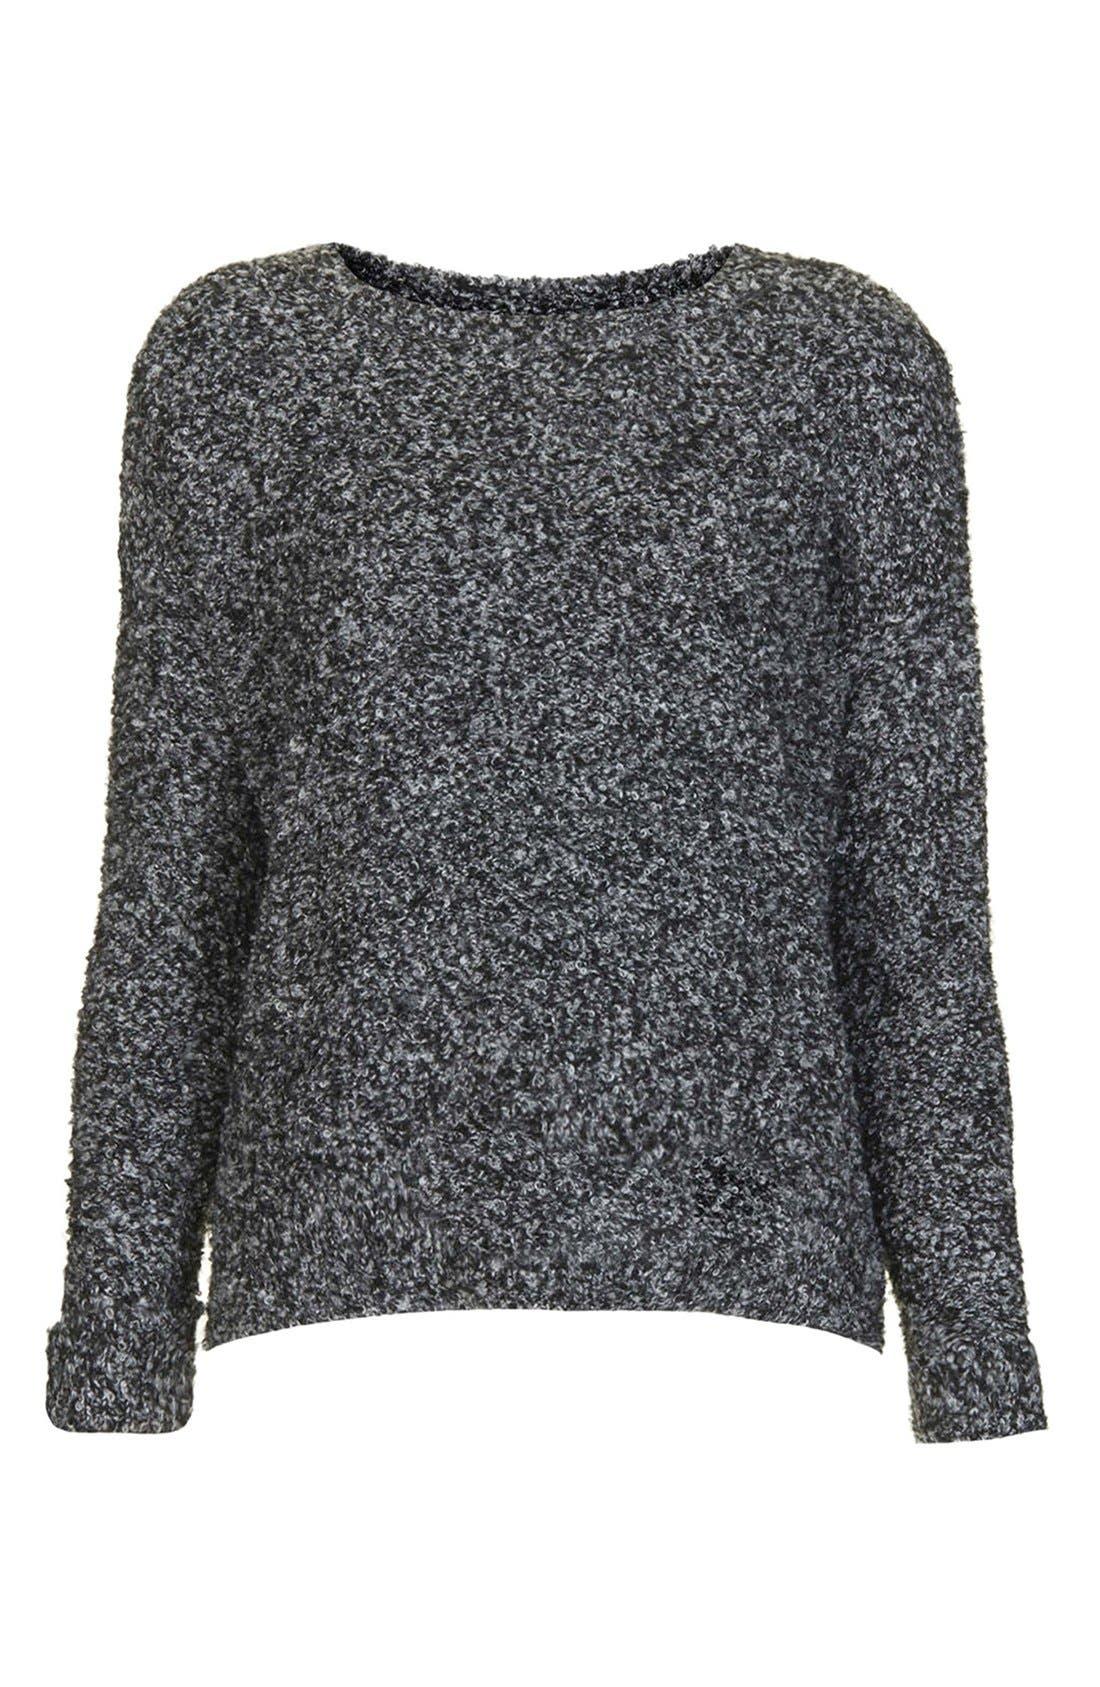 Alternate Image 3  - Topshop Slouchy Bouclé Sweater